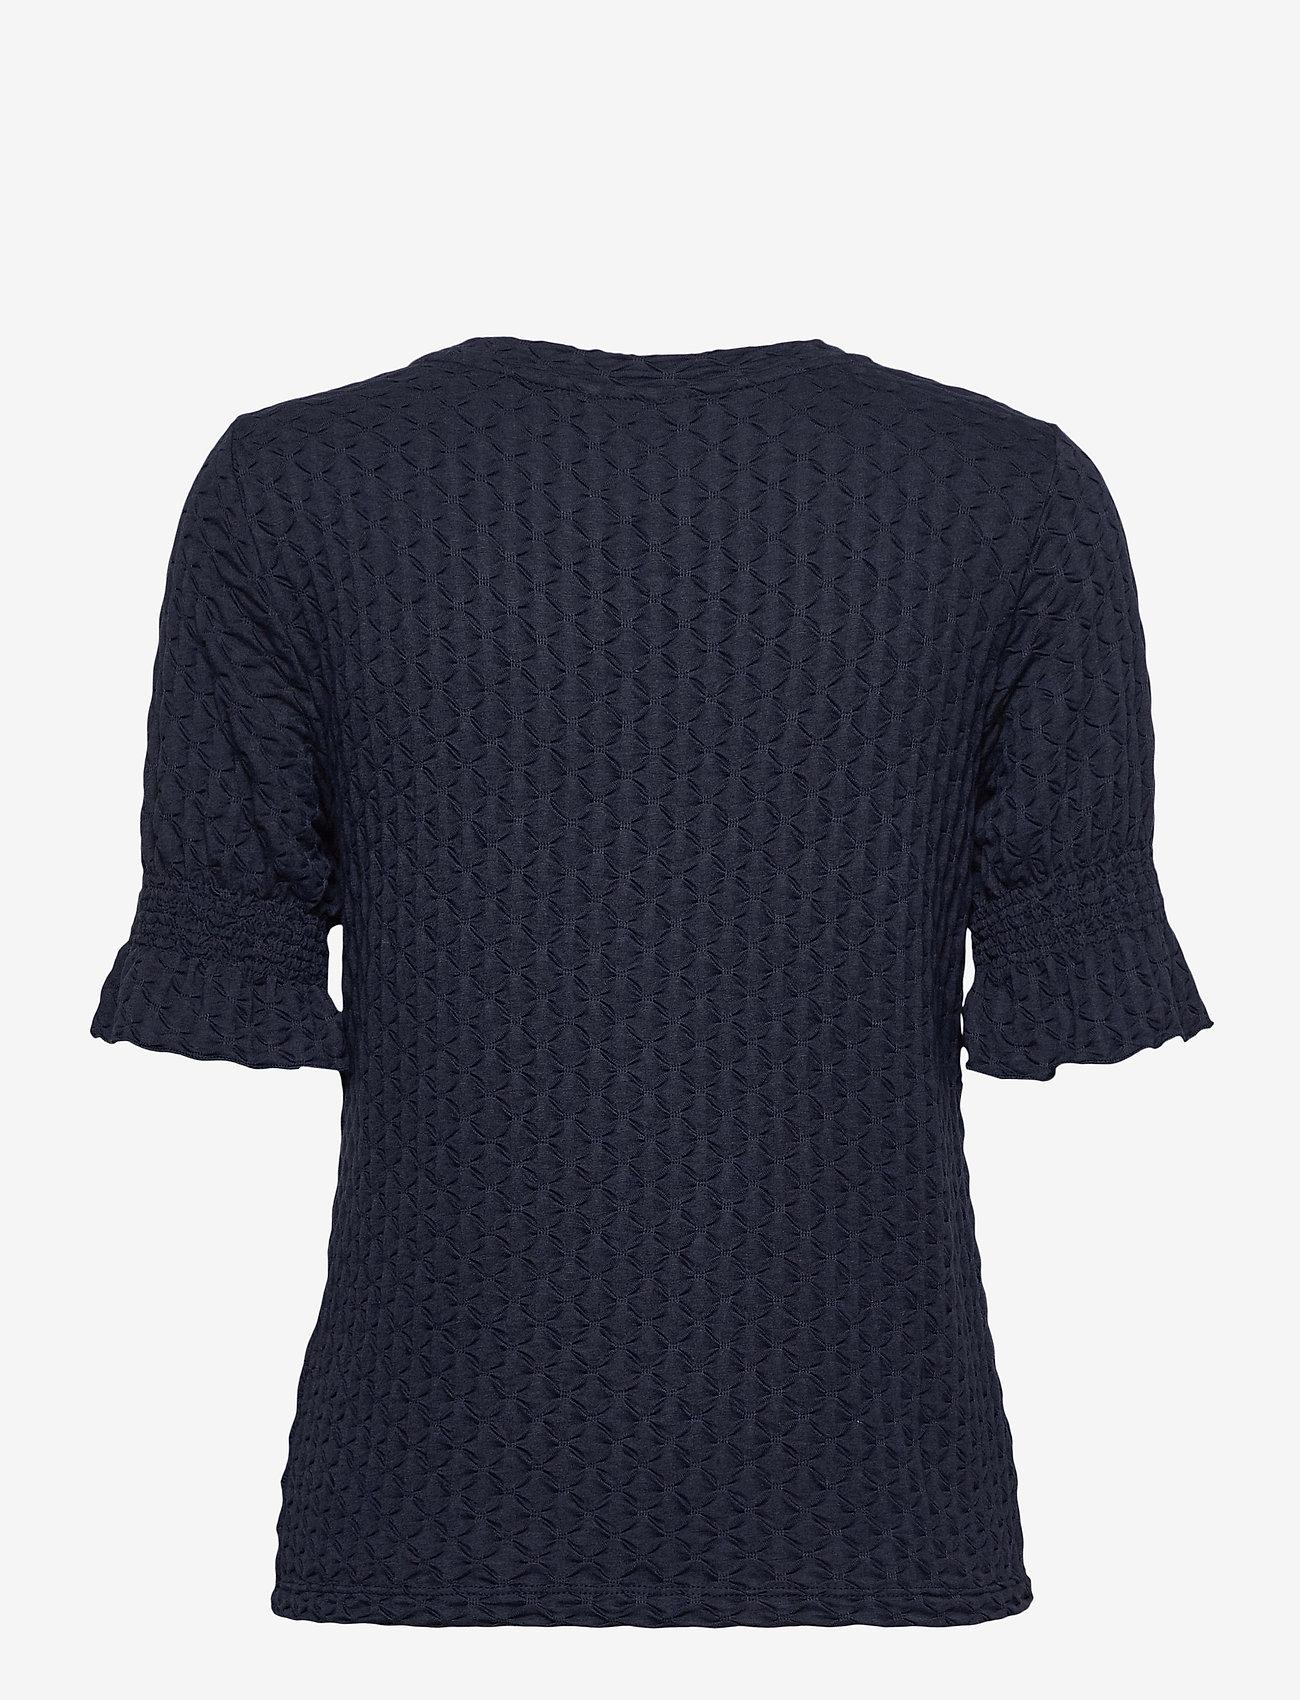 Object - OBJWARINA S/S TOP - t-shirt & tops - sky captain - 1